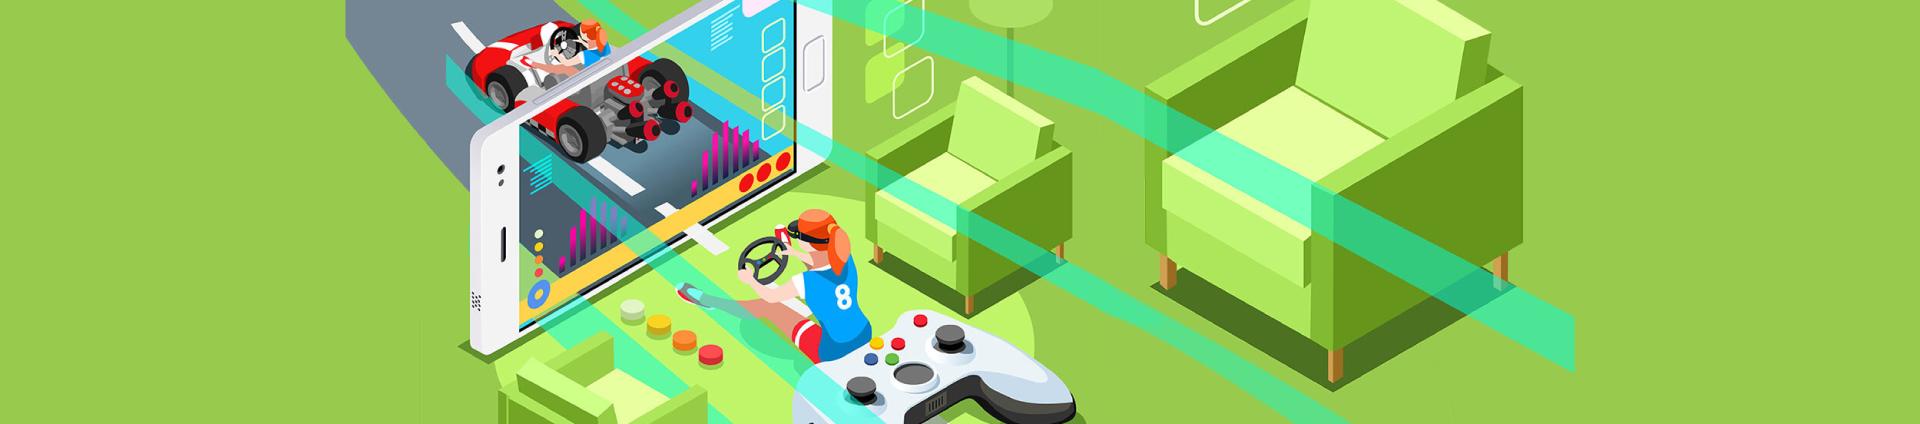 HTML5 Game Development Tools